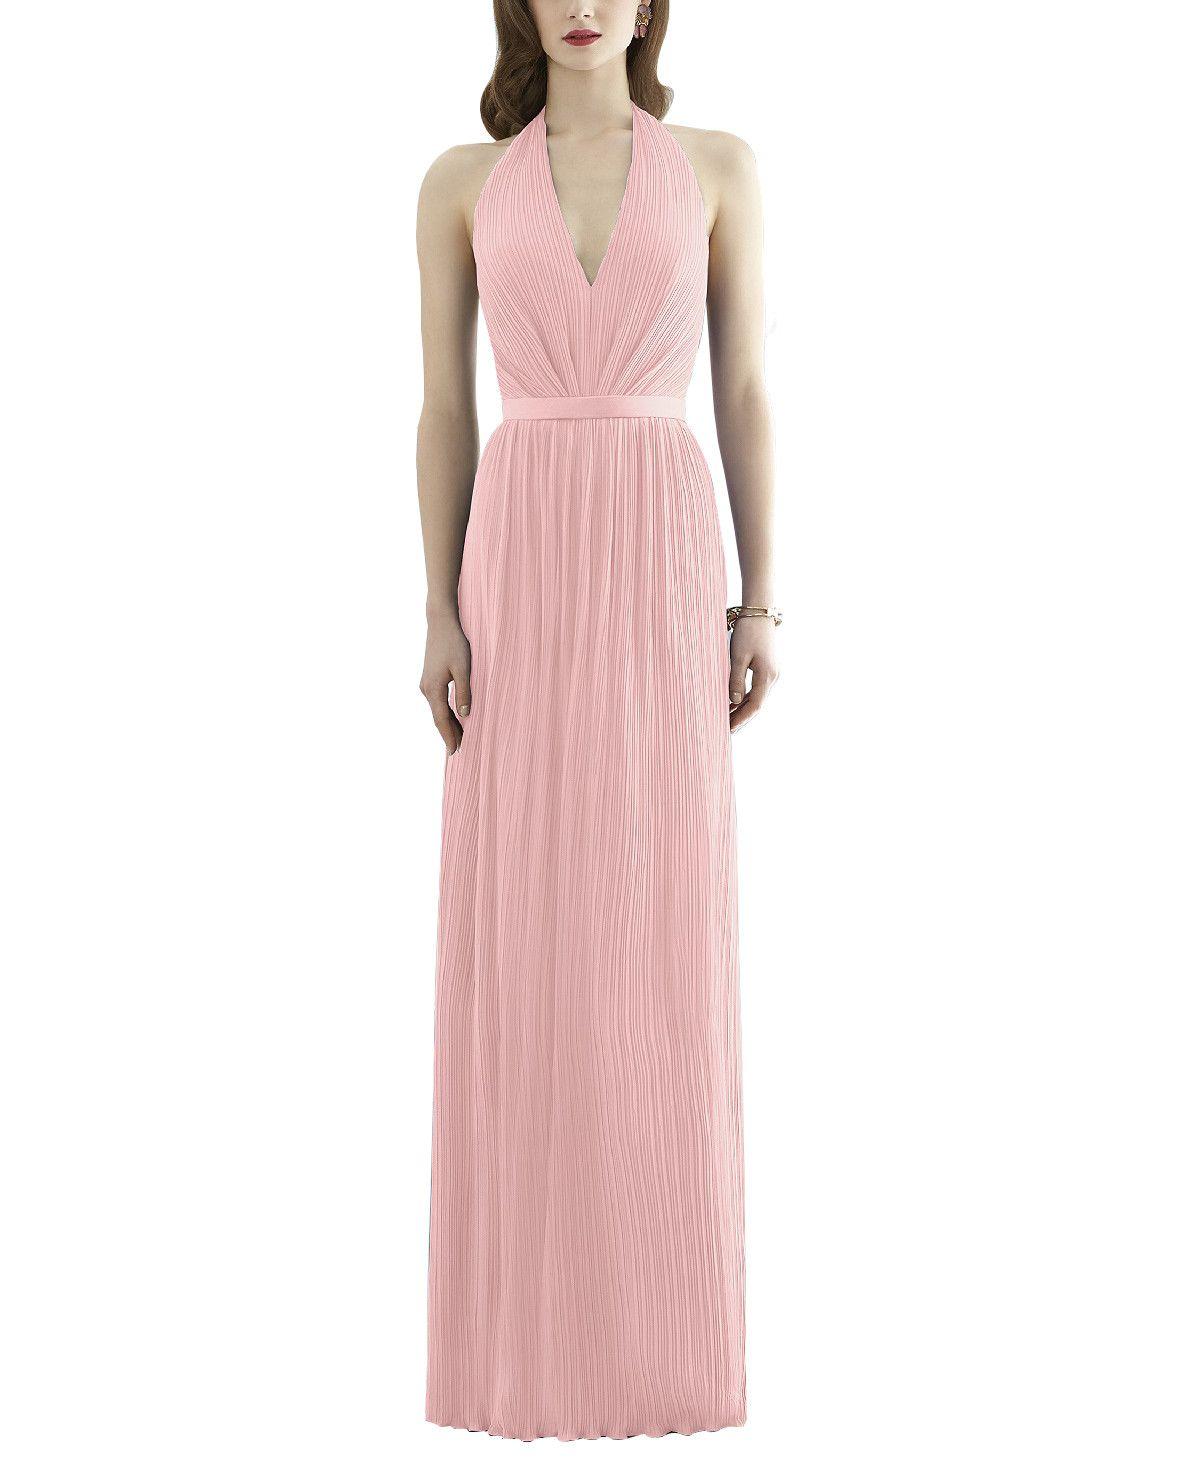 DescriptionDessy Collection2941Fulllength bridesmaid dressHalter necklineMatching matte satin 1